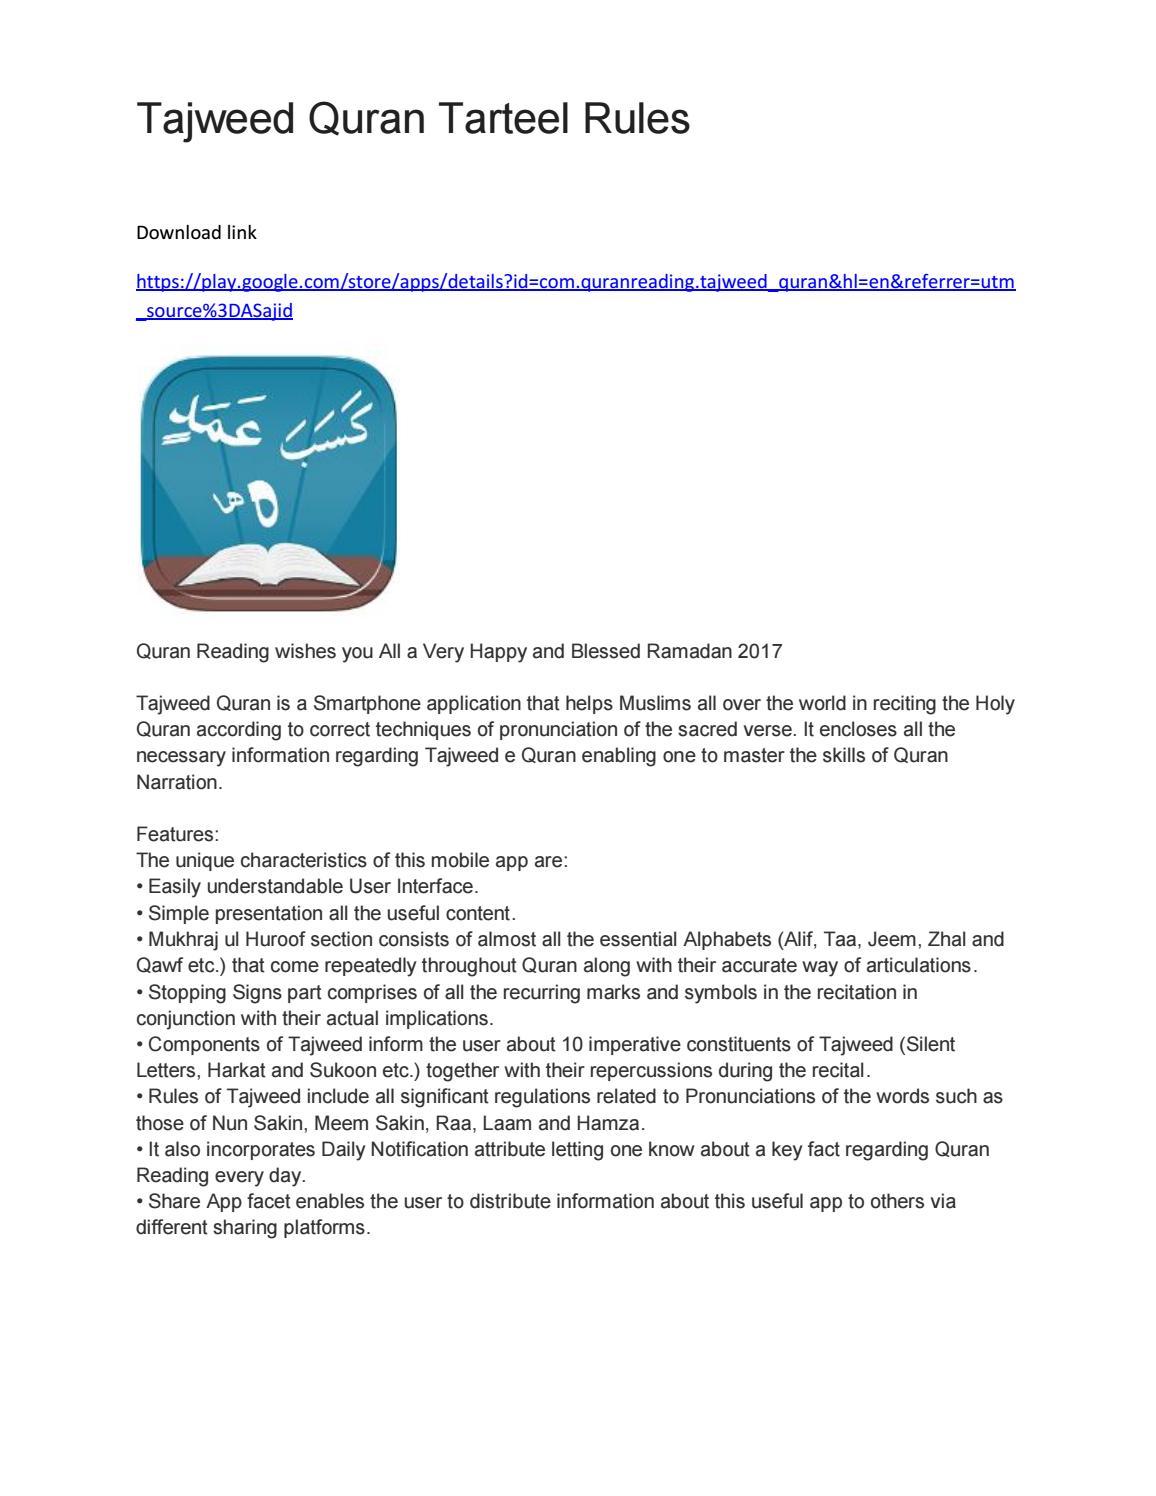 Tajweed quran tarteel rules by Android apps - issuu